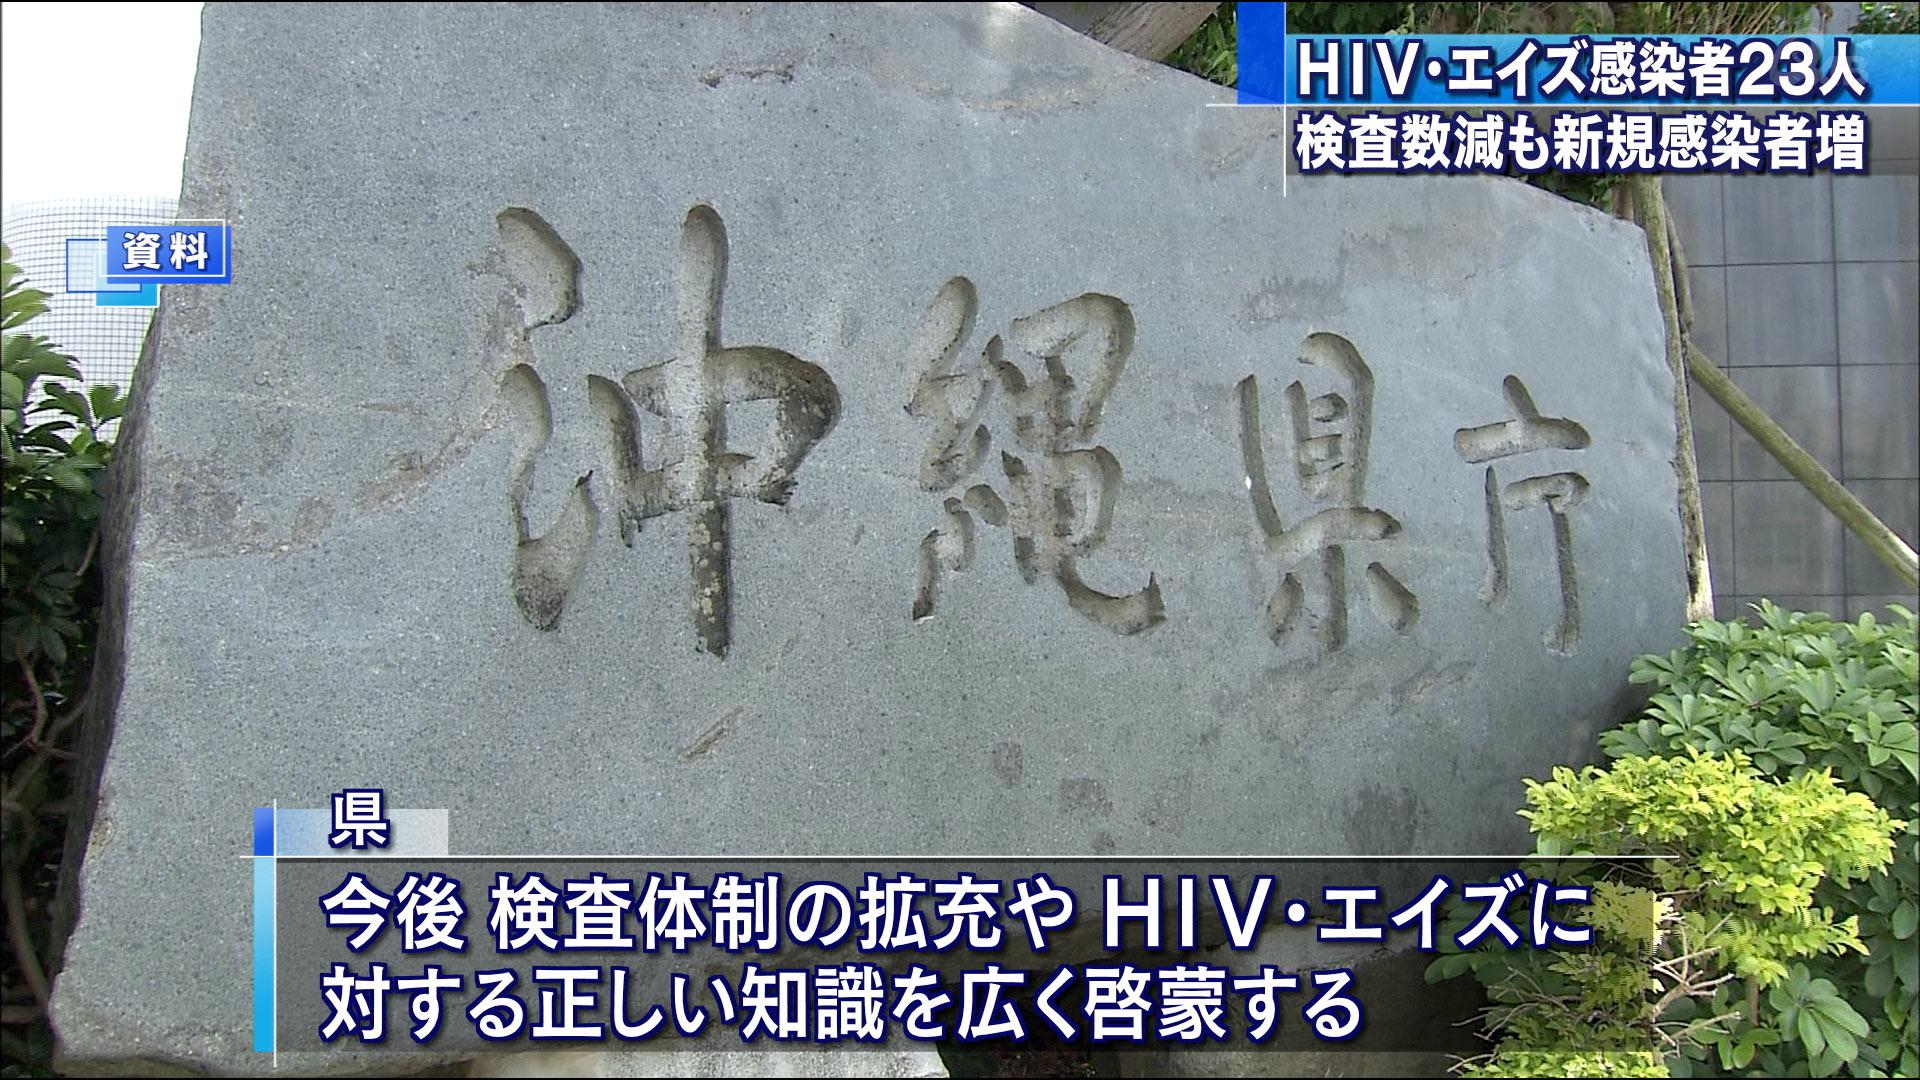 HIV・エイズ 検査数減も新規感染者増加